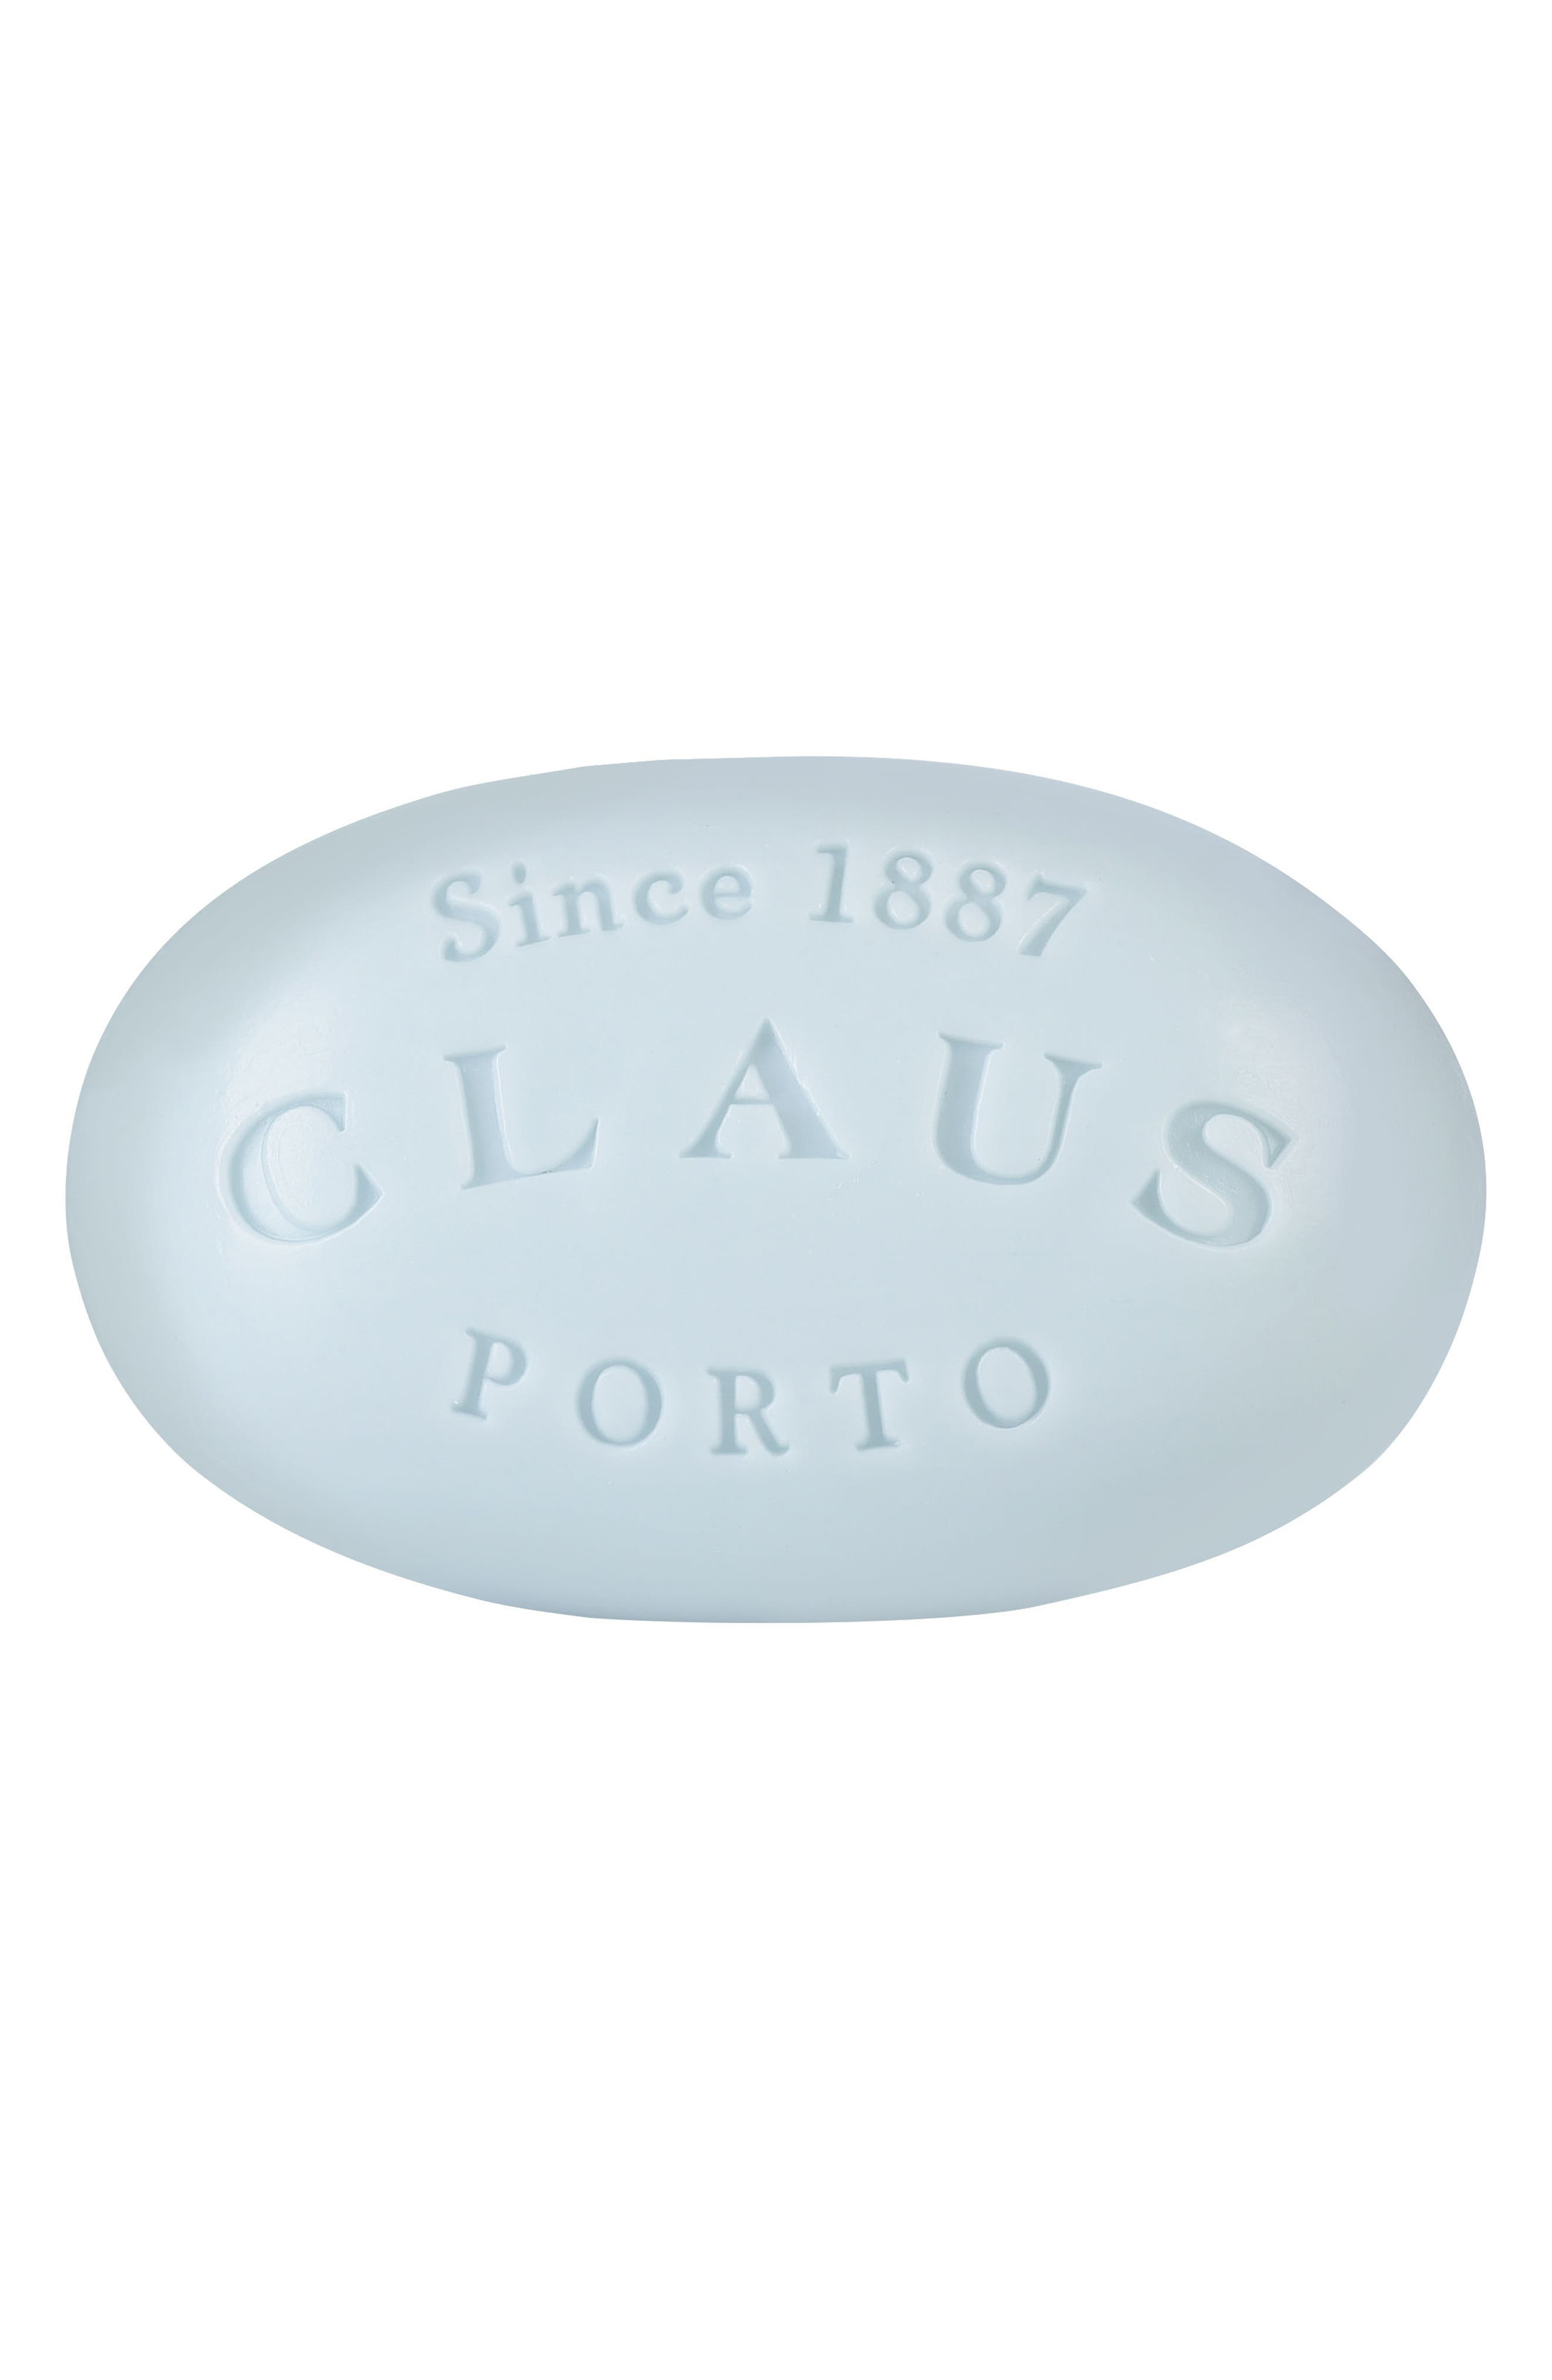 Main Image - Claus Porto Cerina Brise Marine Soap